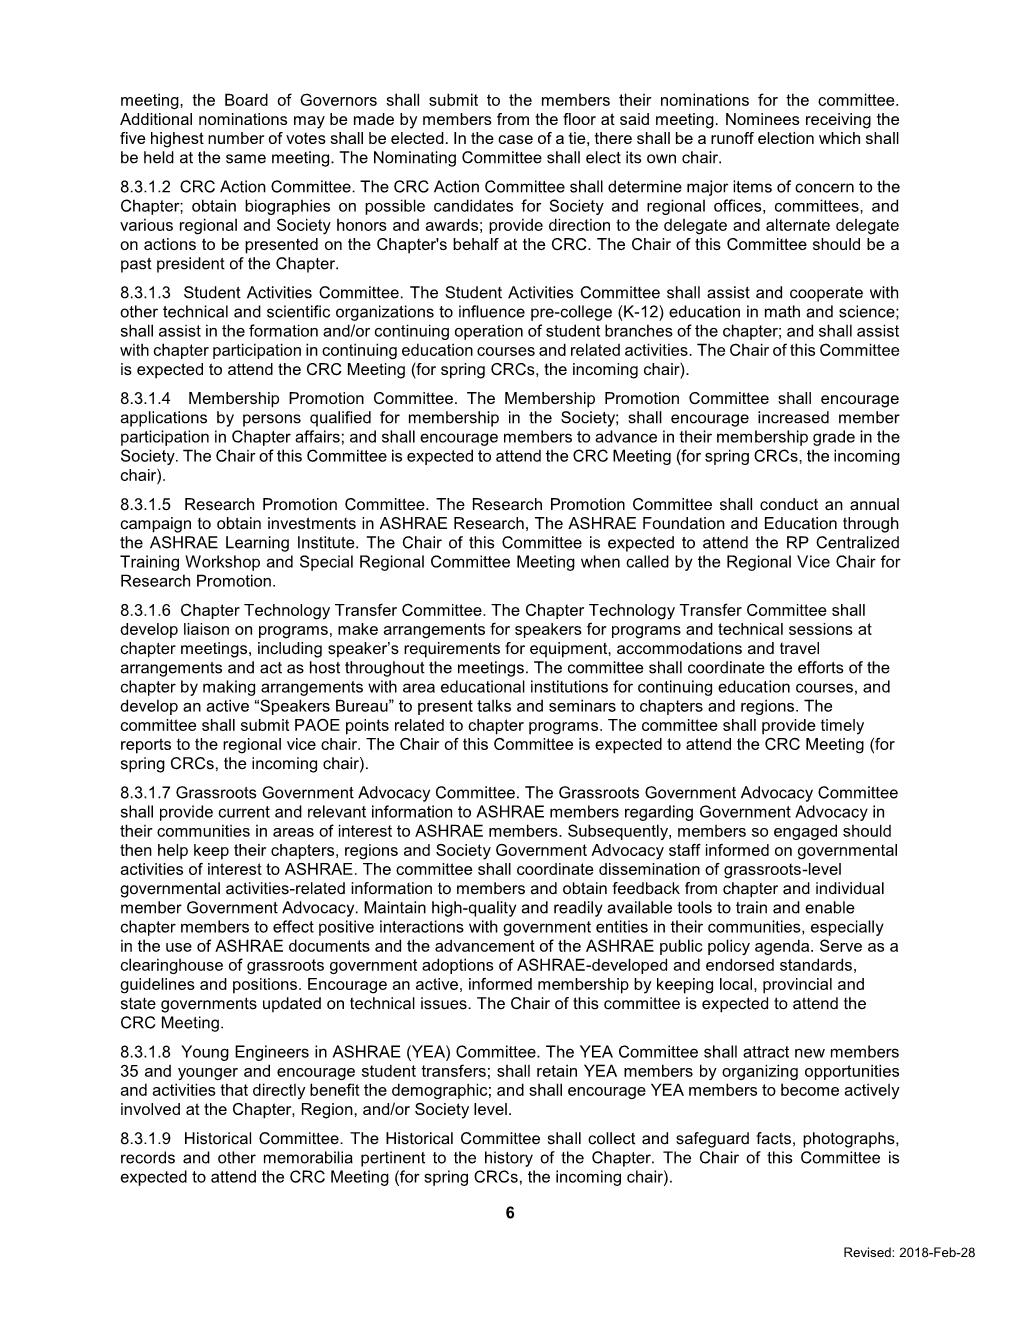 Southern Alberta Chapter CBL Page 006.png